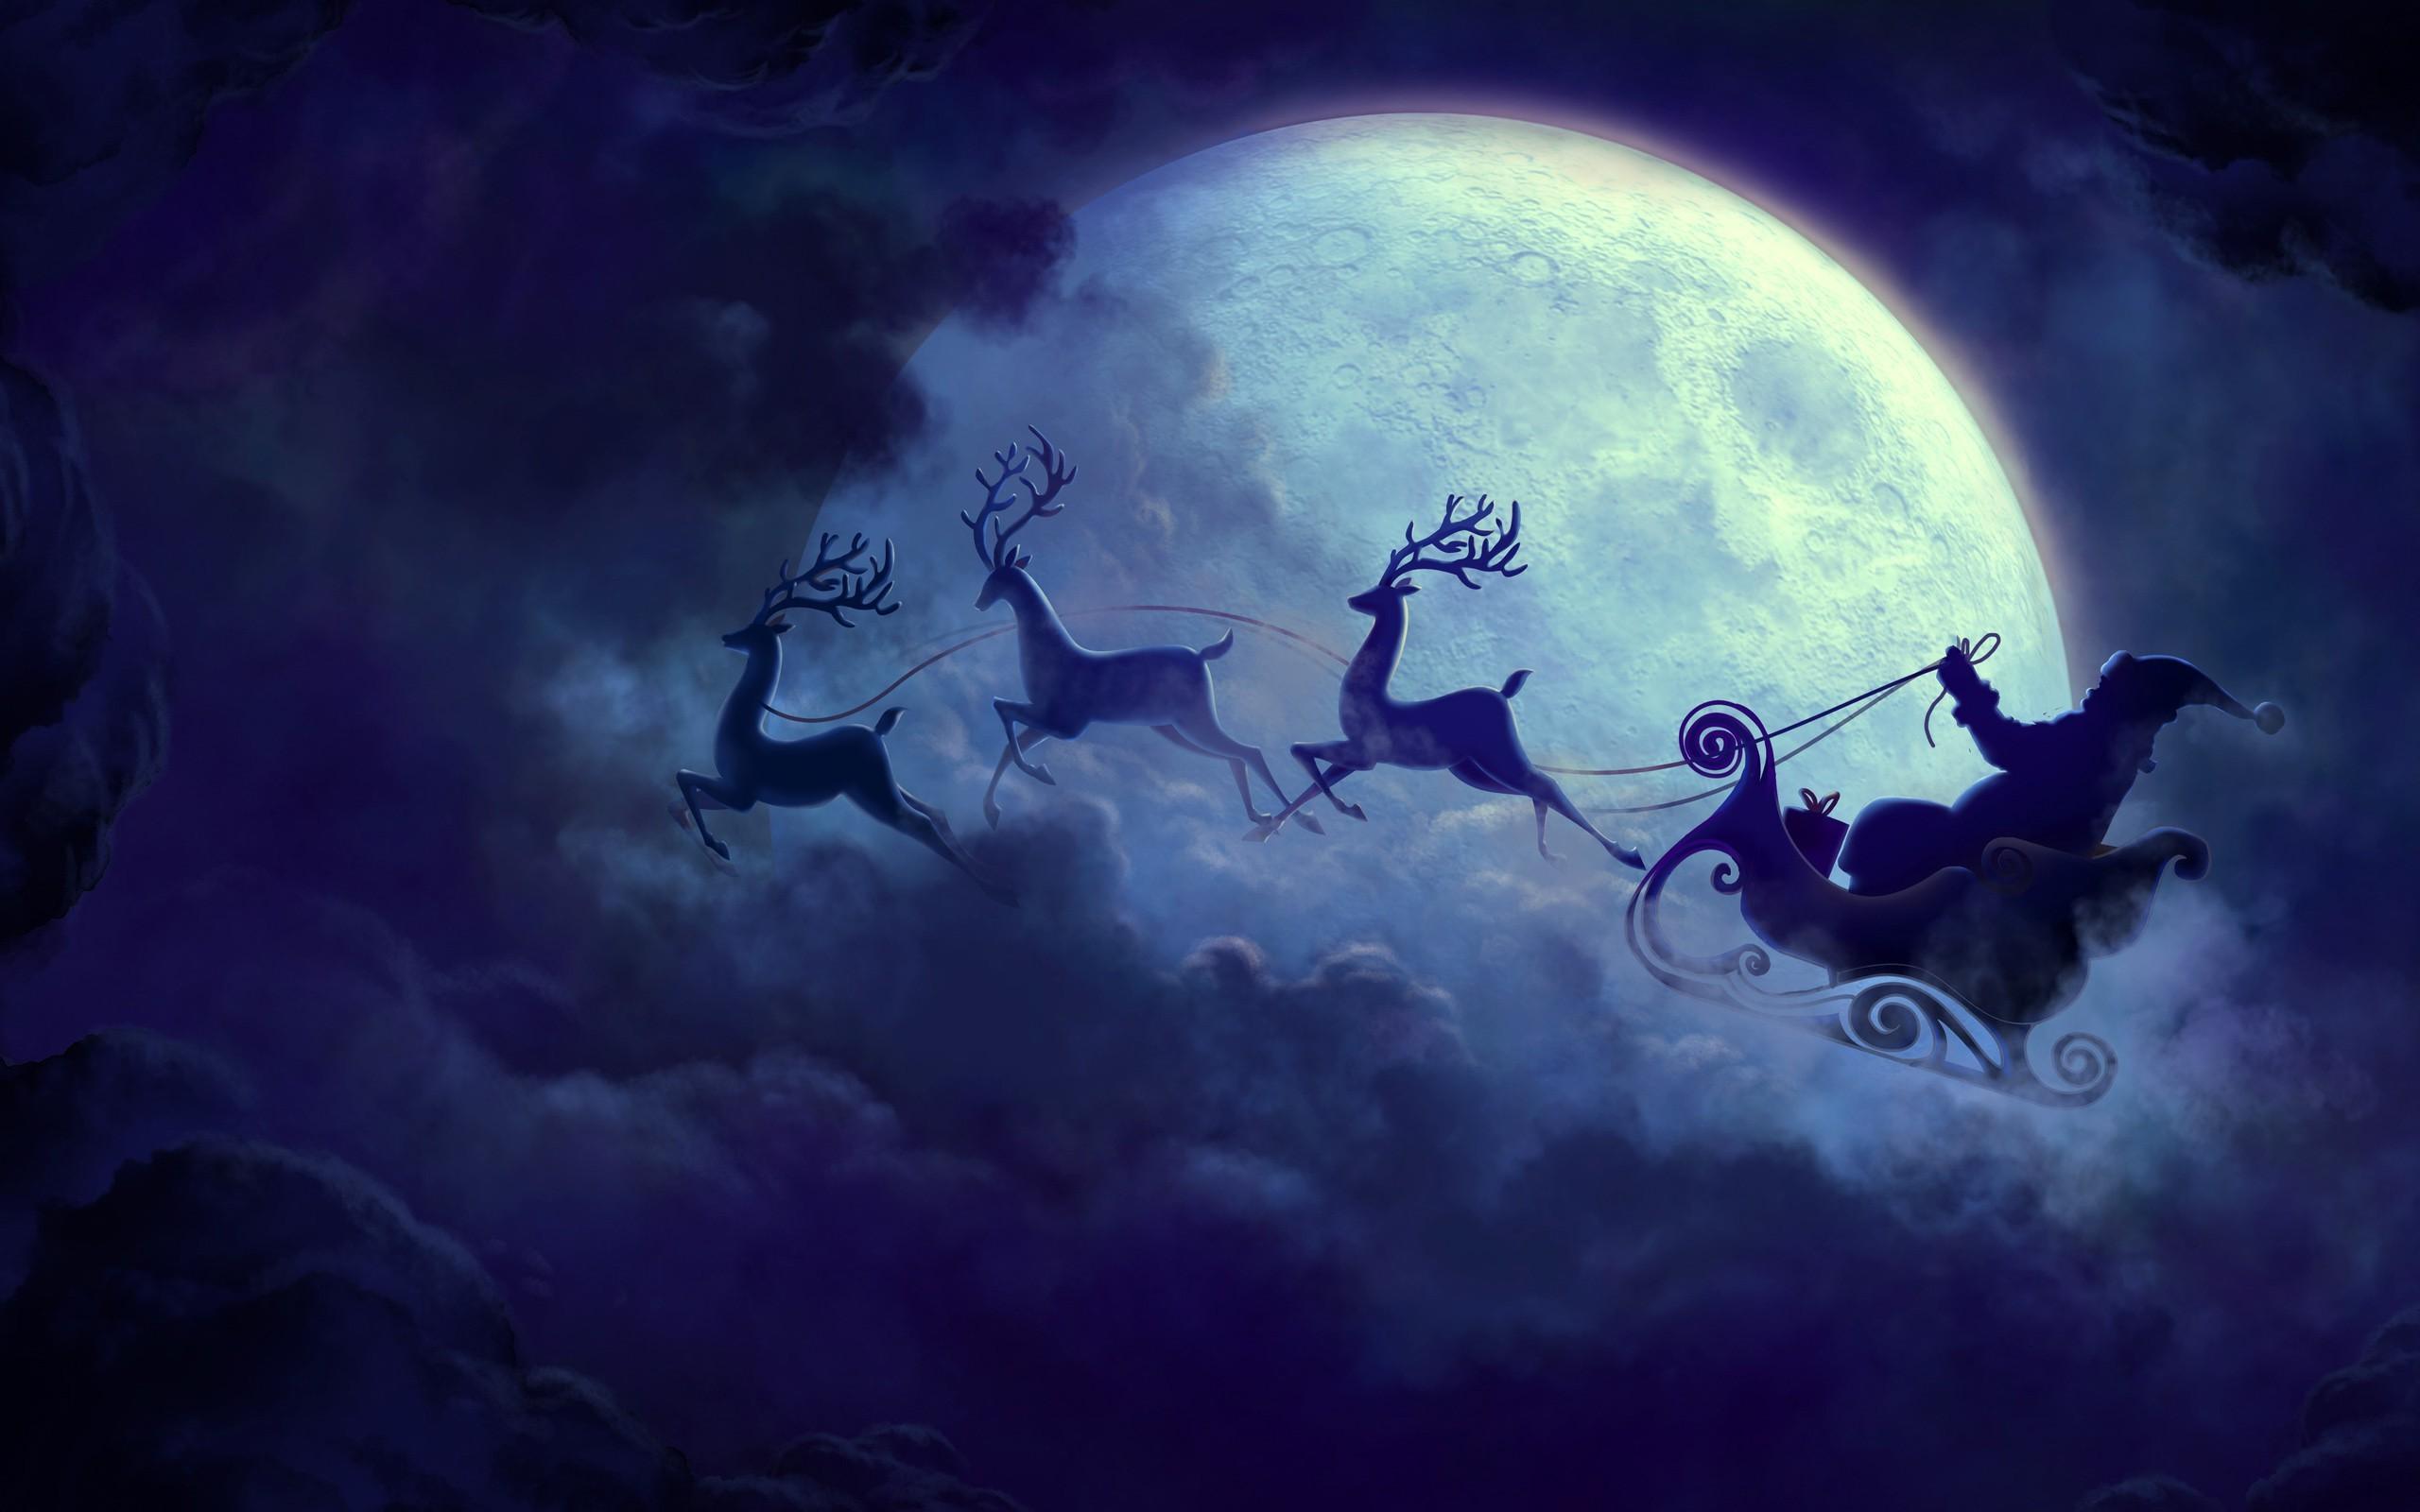 Christmas Moon wallpapers (50 Wallpapers)